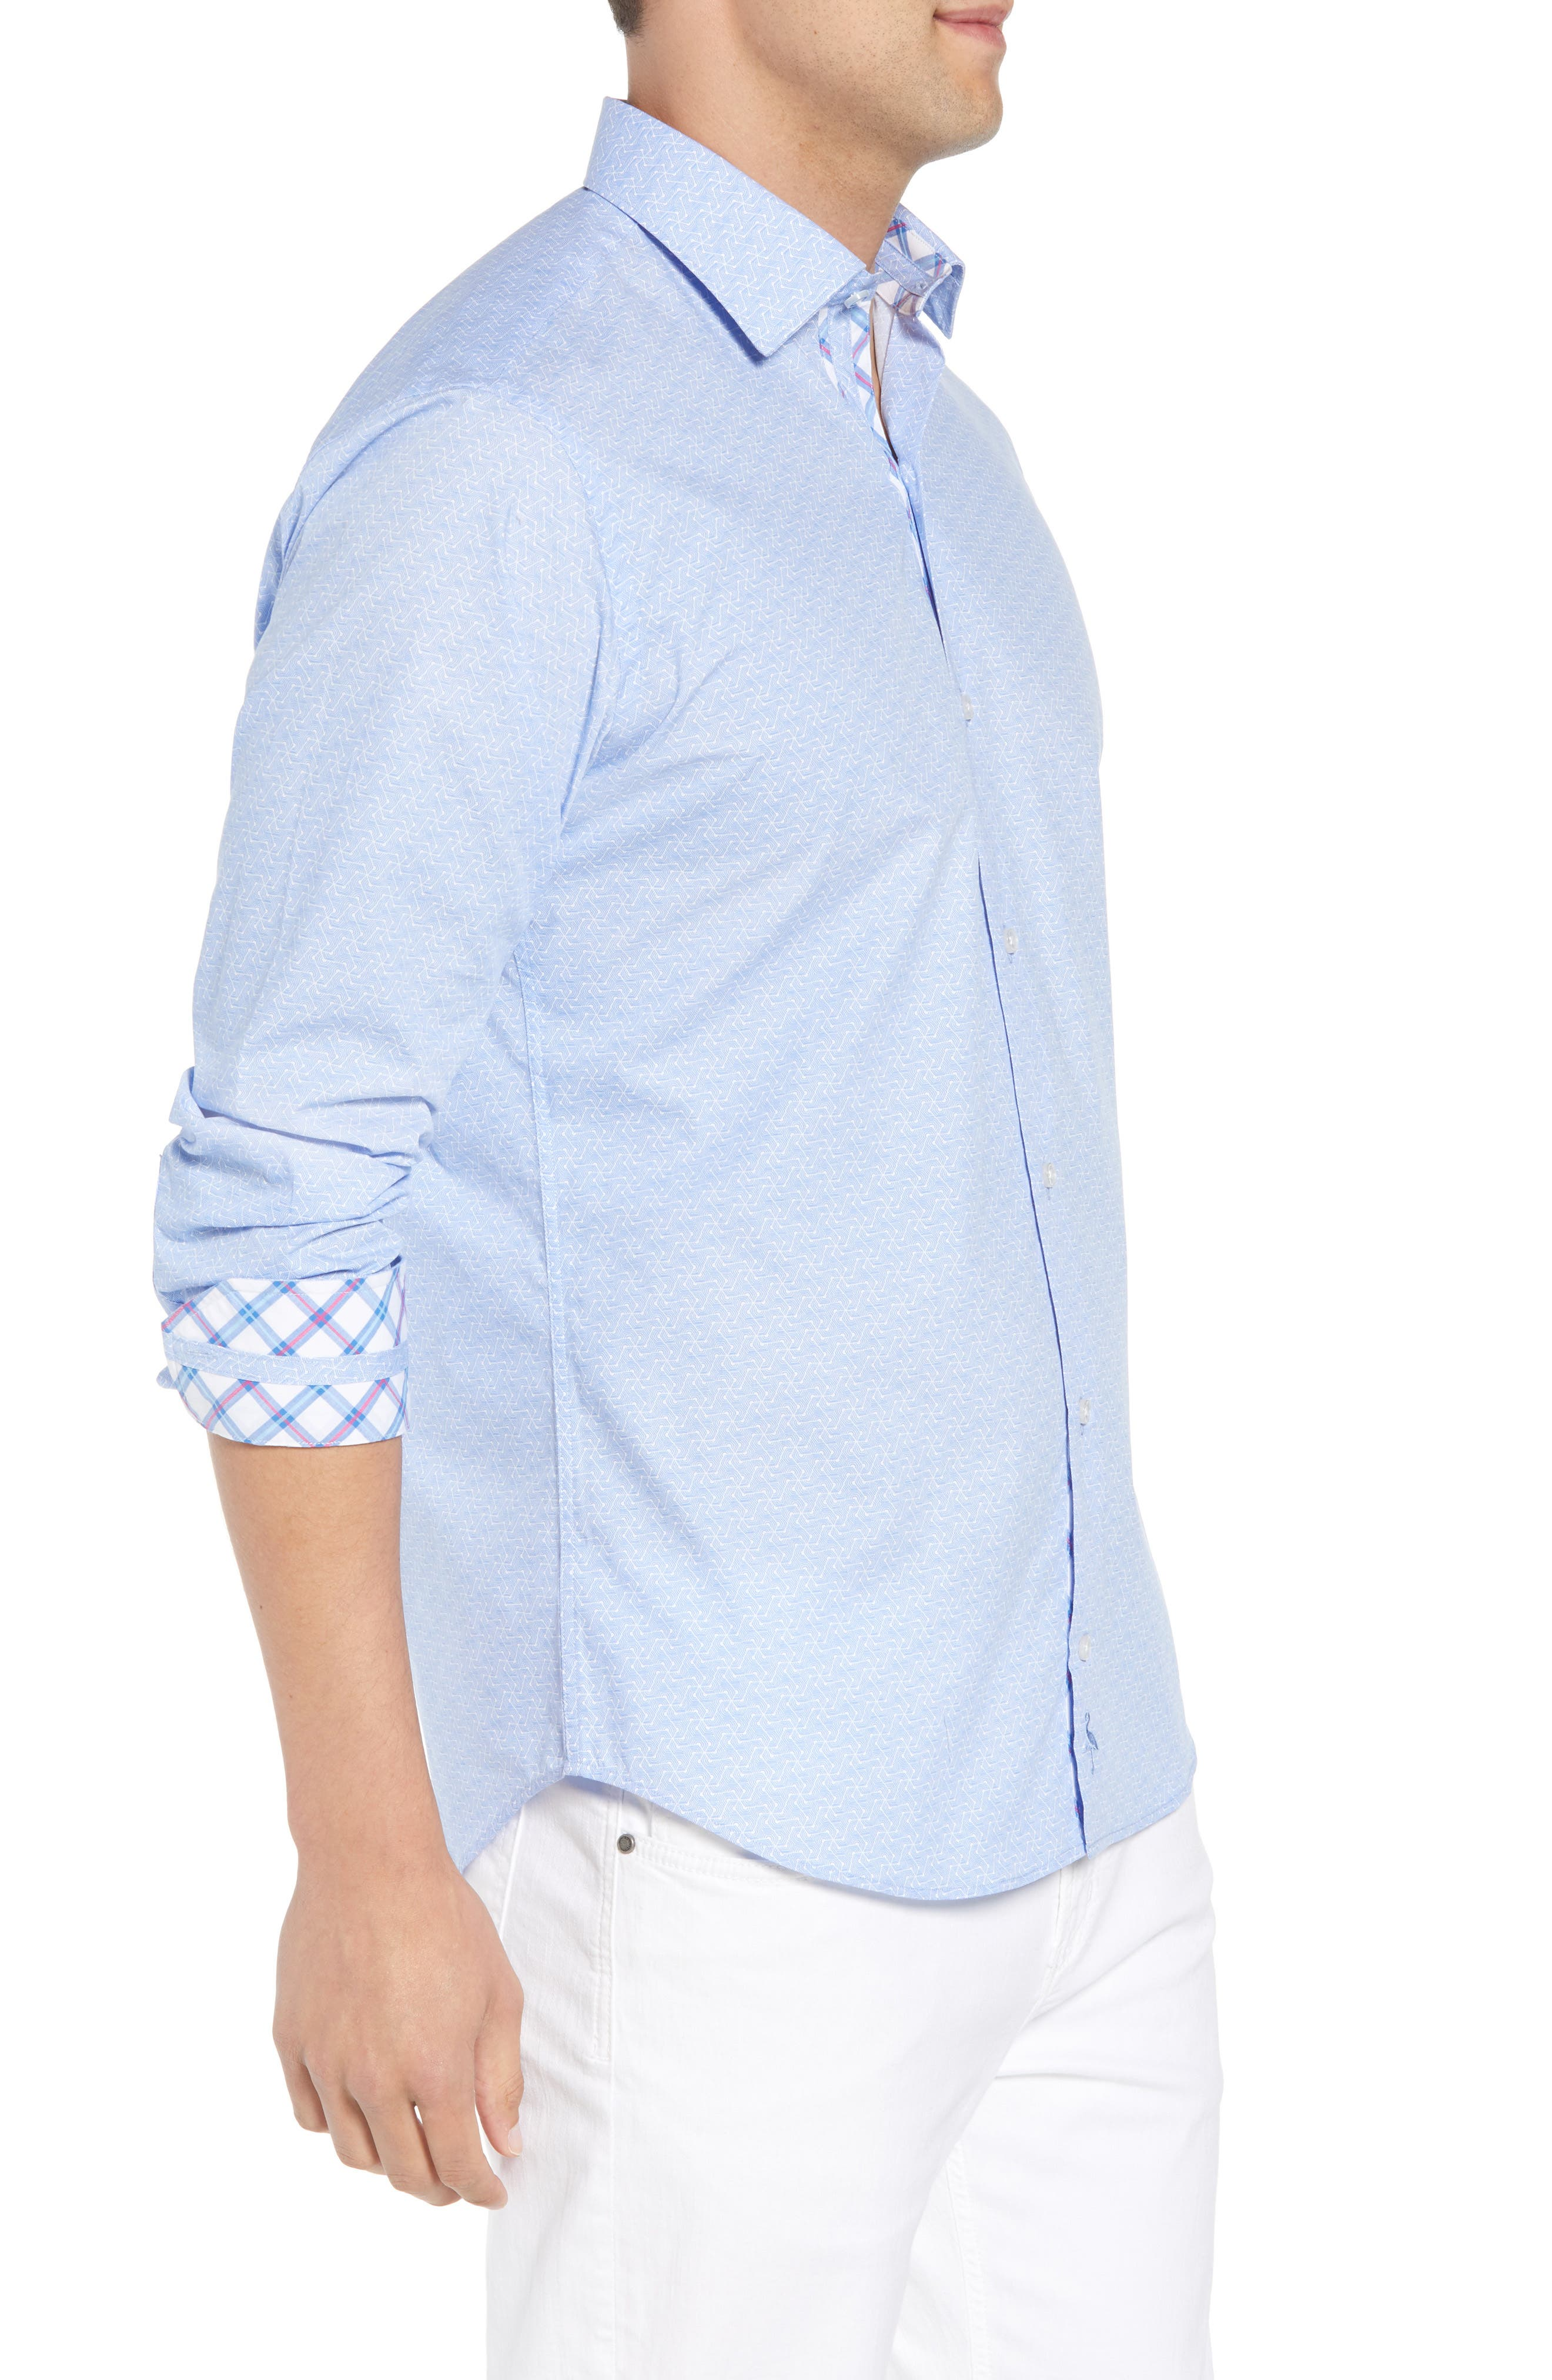 Beckham Regular Fit Plaid Sport Shirt,                             Alternate thumbnail 4, color,                             Light Blue